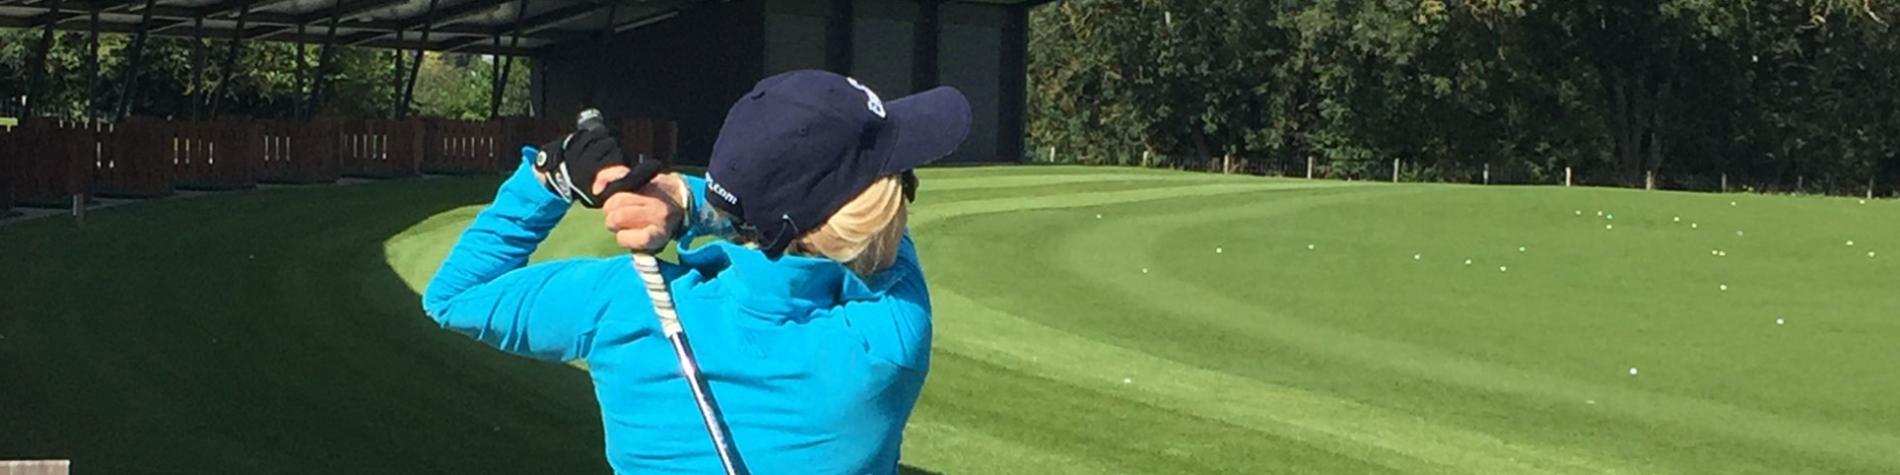 Golf - Naxhelet - practice